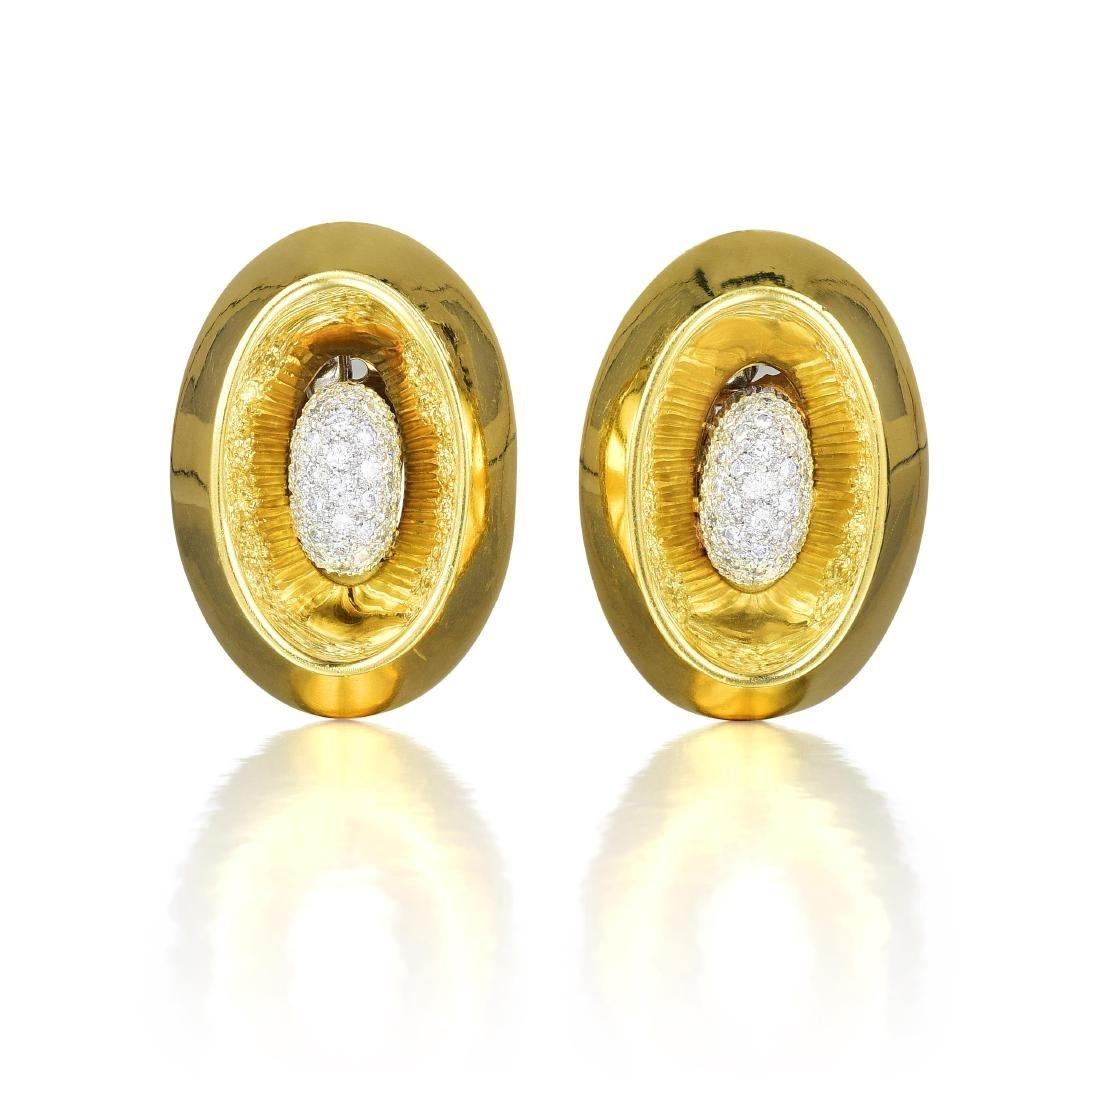 Takashi Wada Diamond Earrings